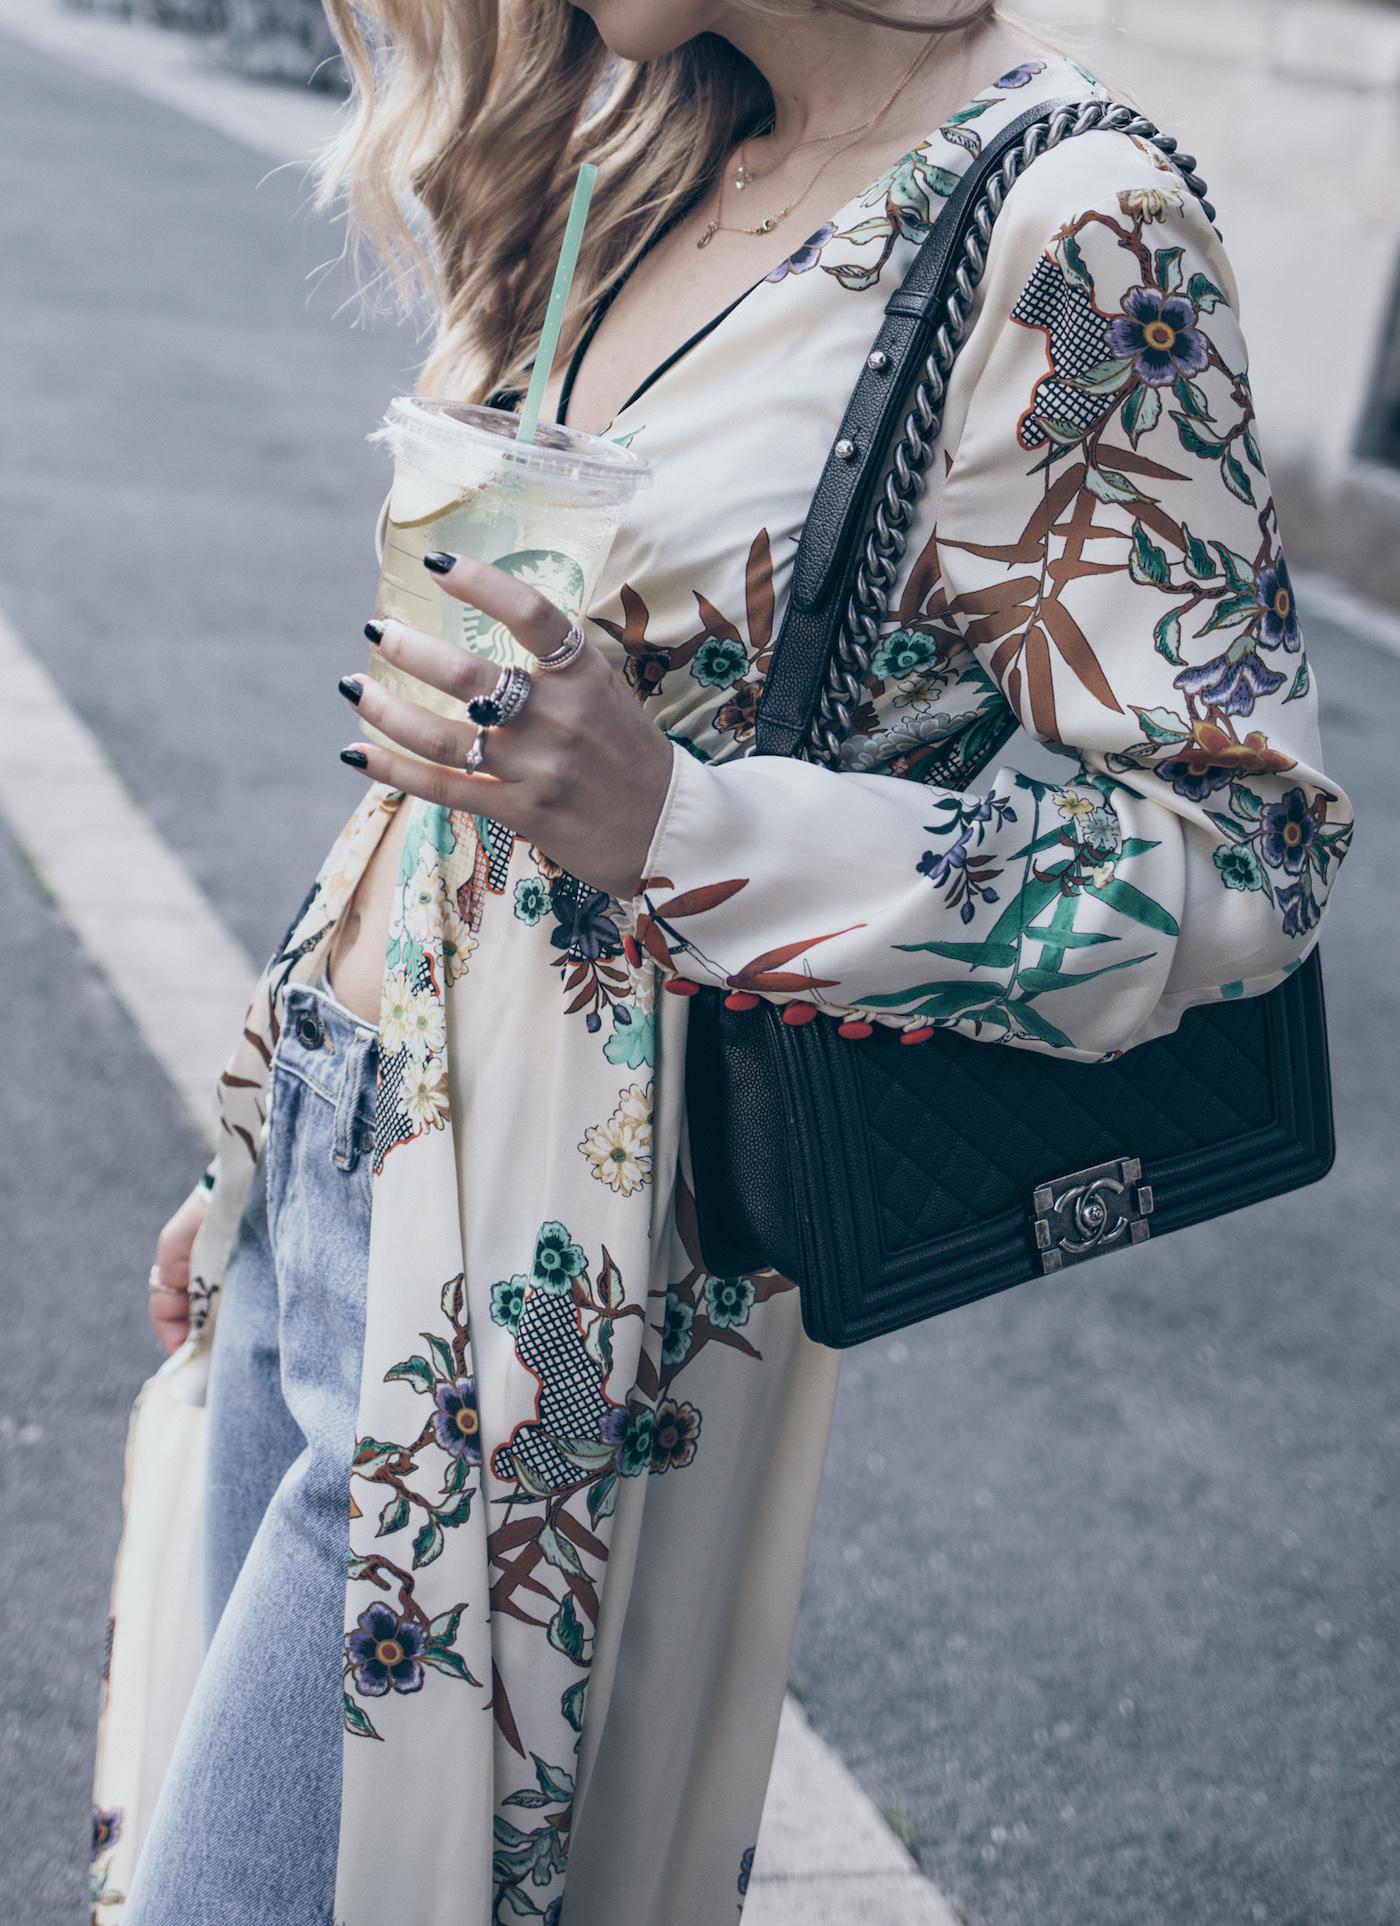 Fashion Blogger Q&A Blog FAQ Zara Kimono Street Style Summer 2017 Want Get Repeat Mode Blog Erlangen Nürnberg